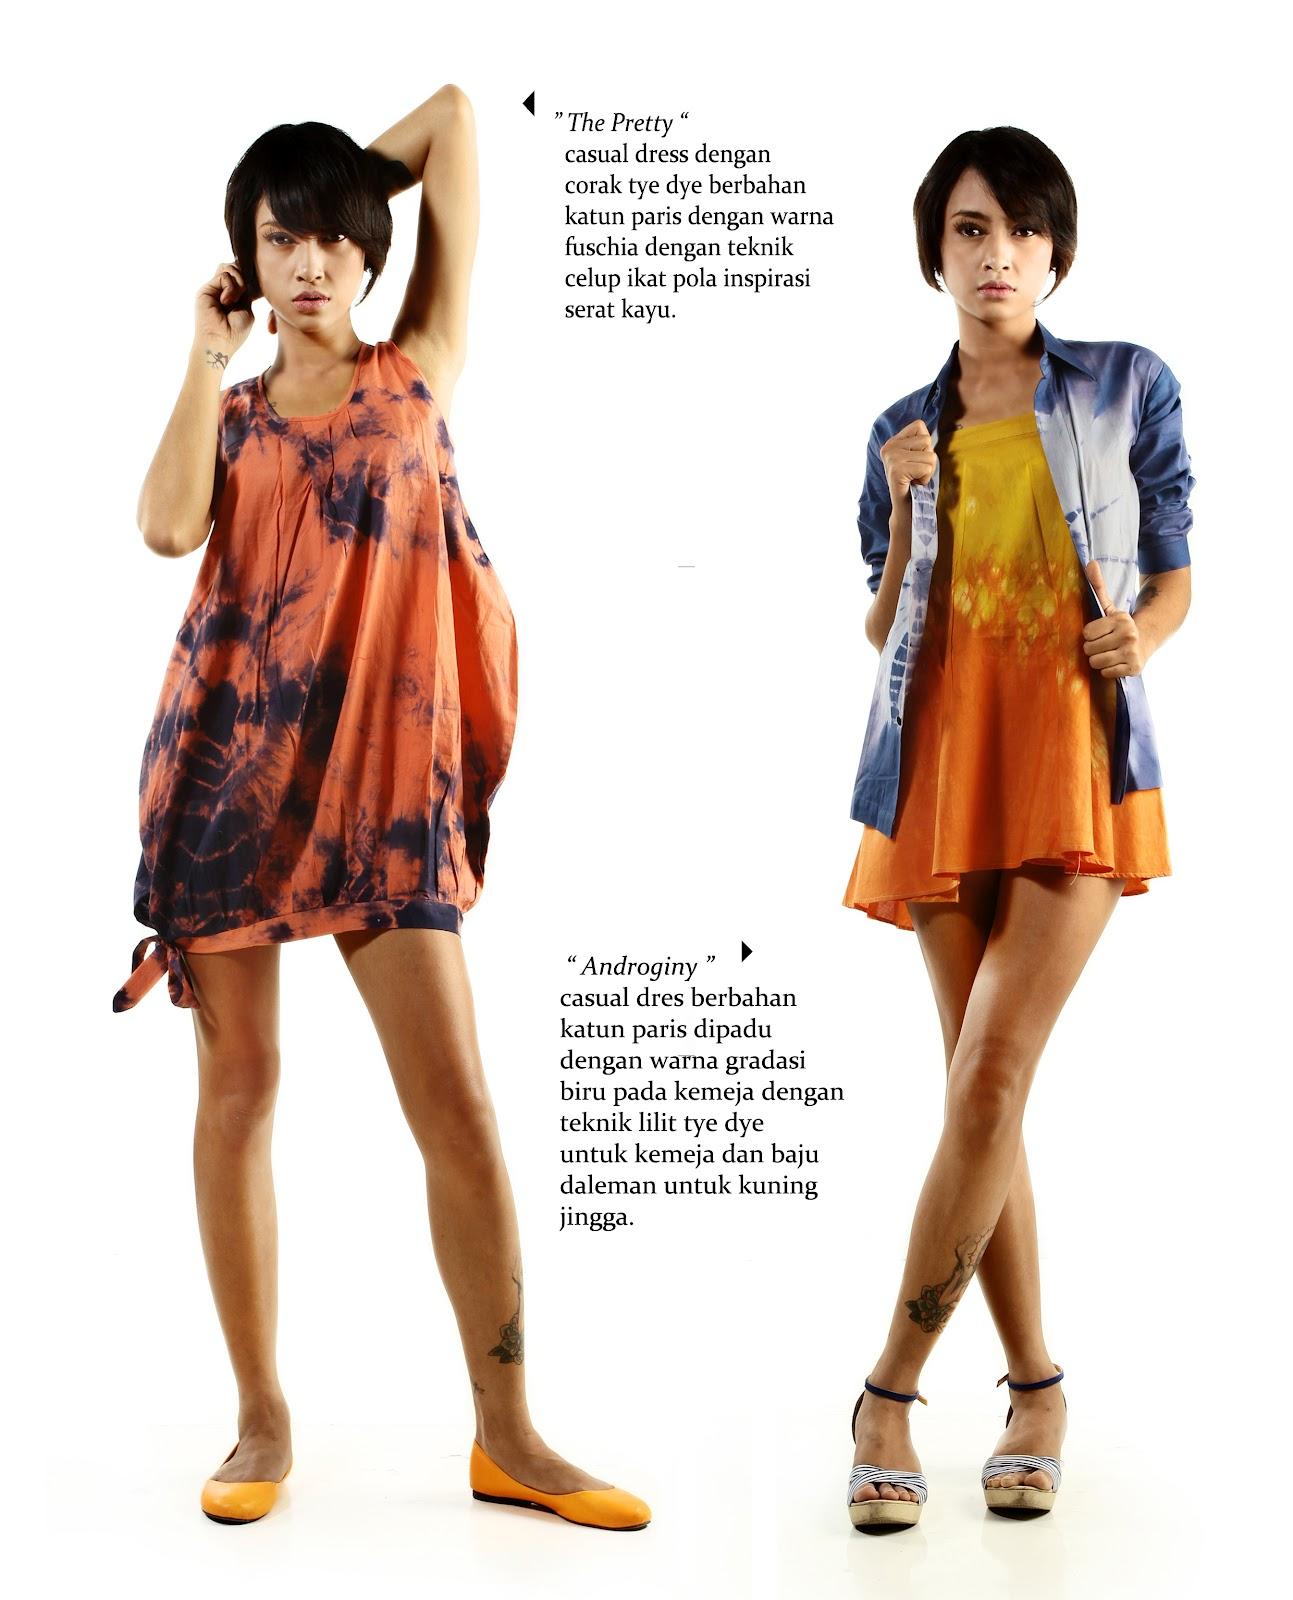 Fashionbooksconcept: FASHION INDONESIA DALAM SENTUHAN